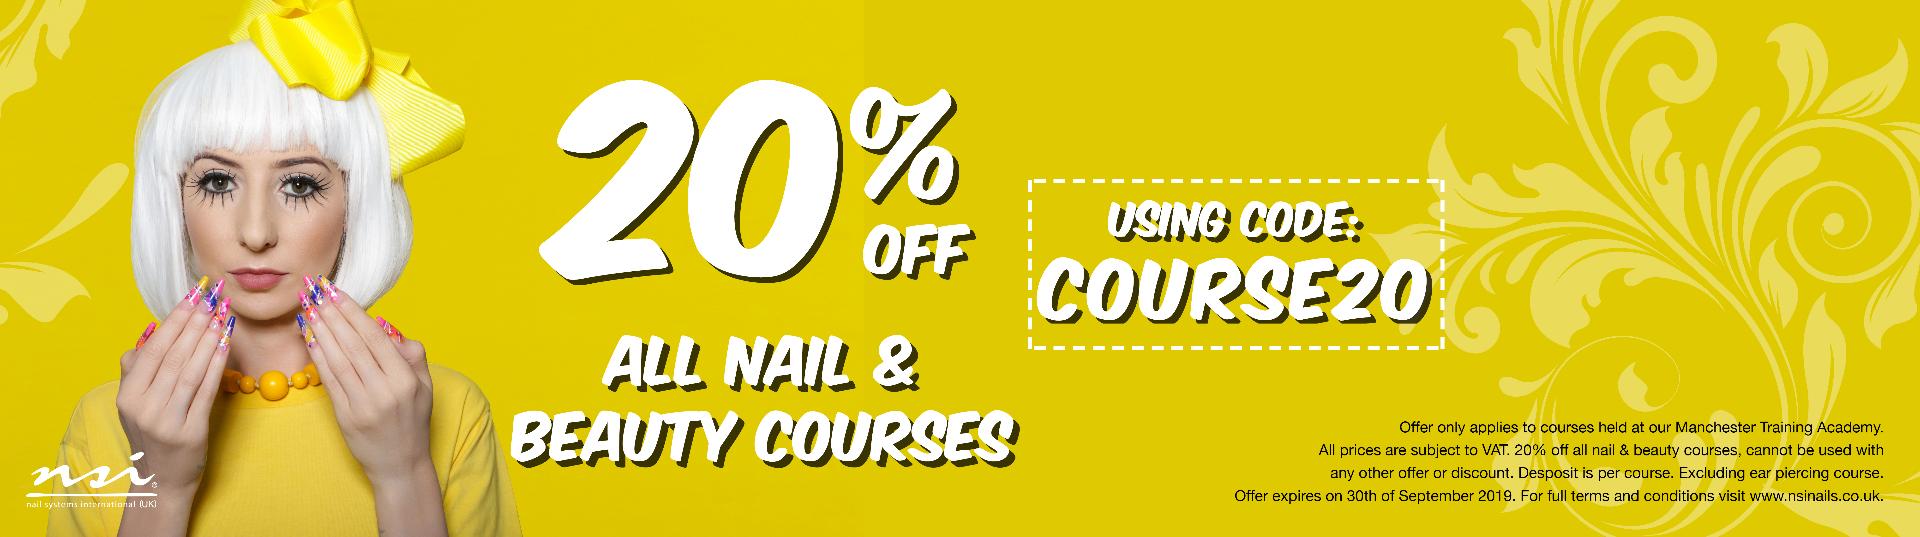 Professional Nail Supplies - Acrylic/Kits/Gel/Gel Polish